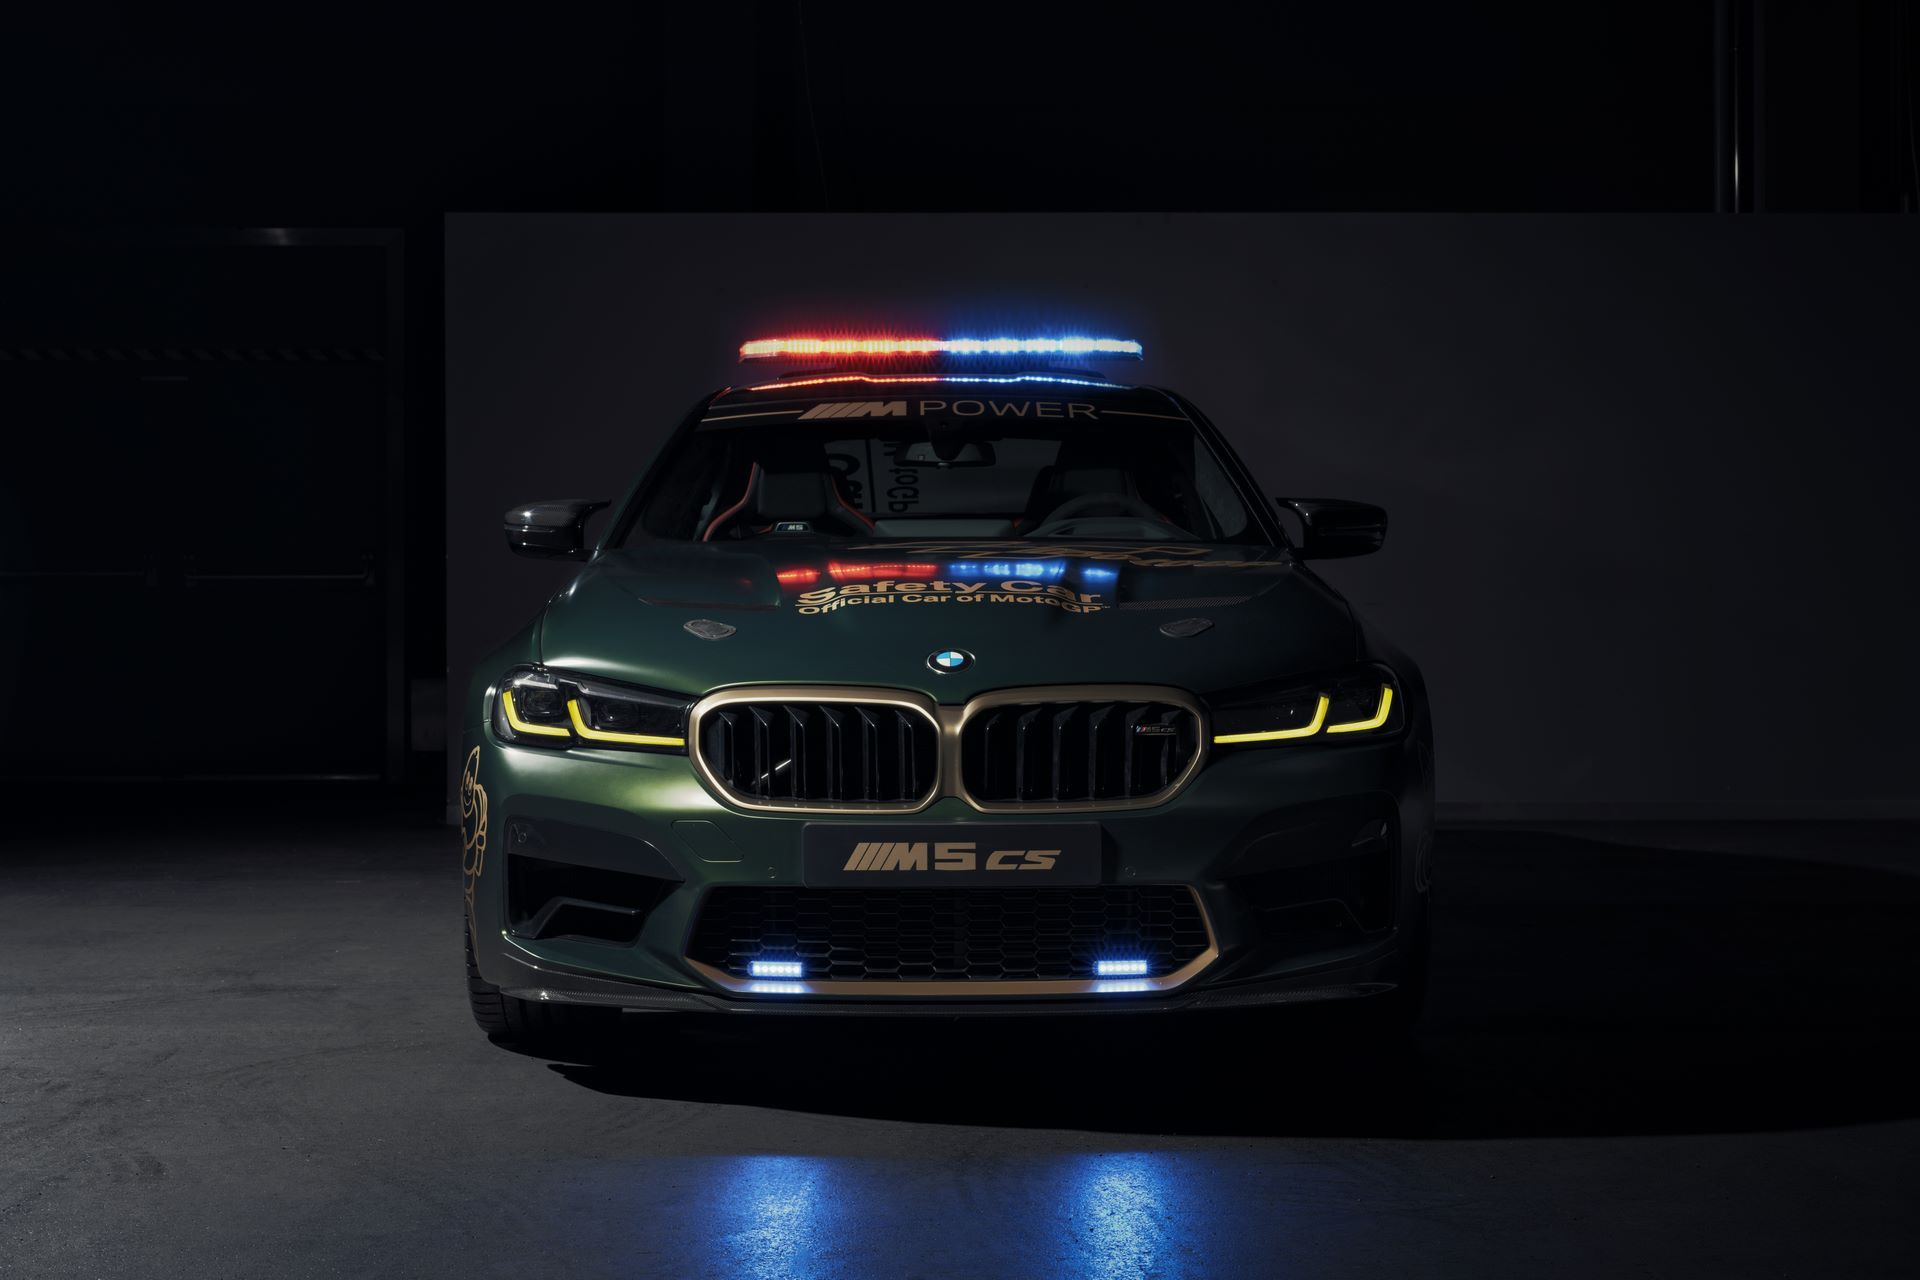 BMW-M3-M4-M5-CS-Safety-Cars-moto-gp-motogp-14